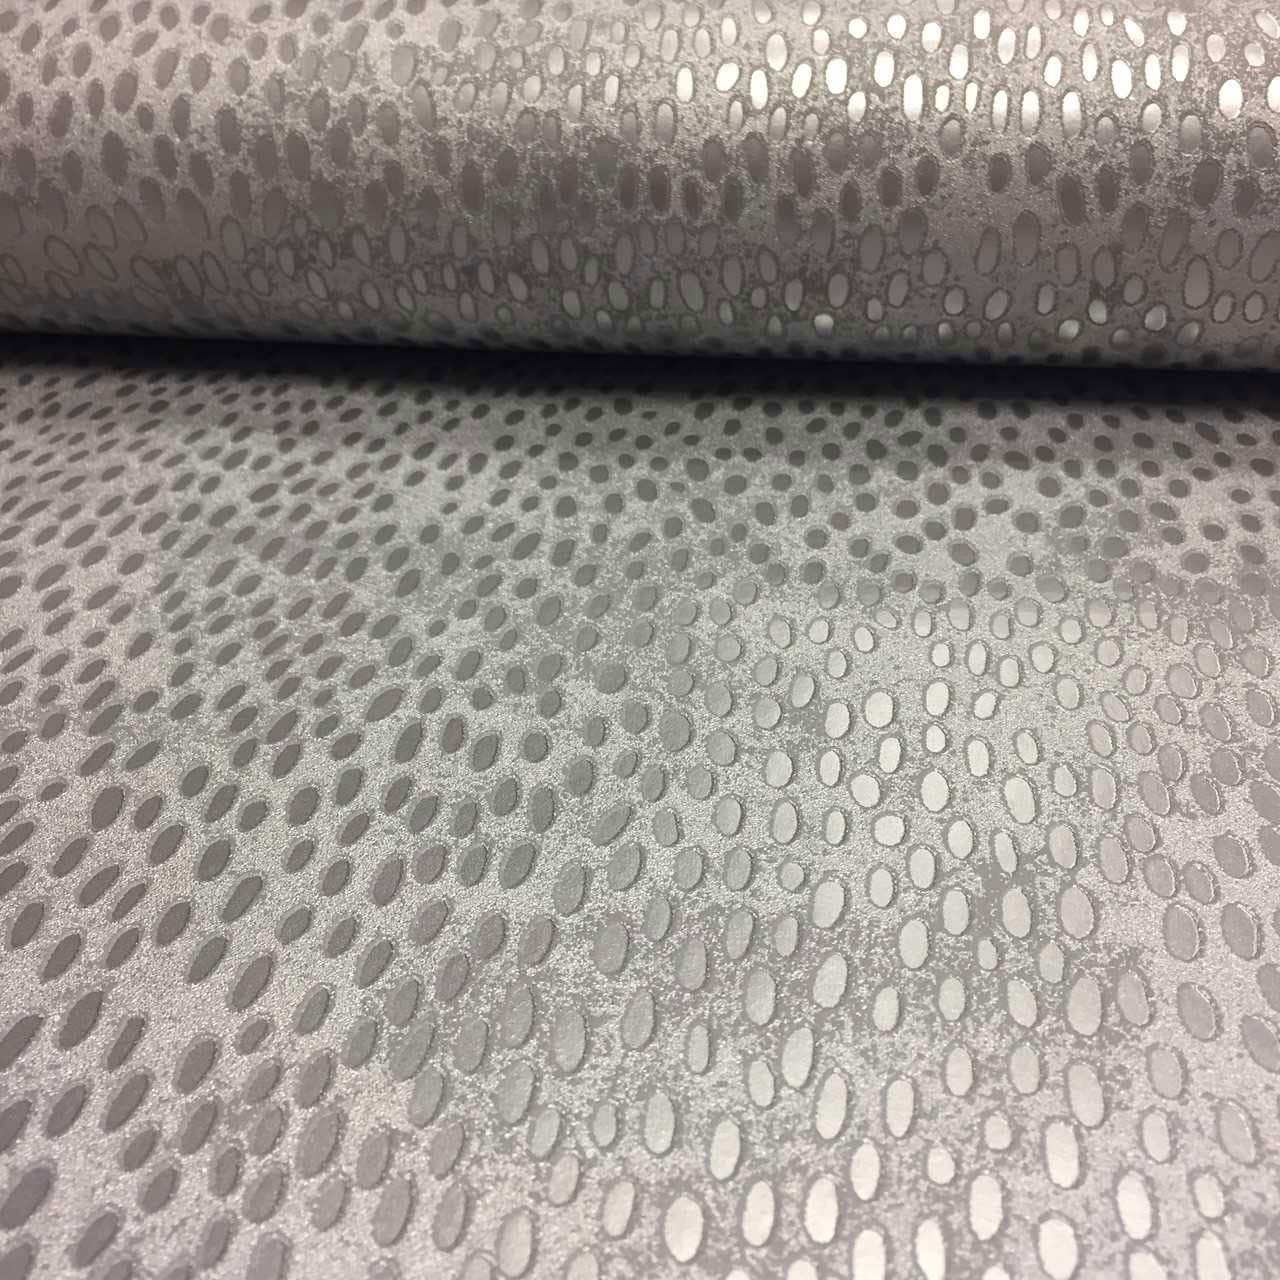 Shiny-Metallic-Scales-Wallpaper-Textured-Finish-Luxury-Modern-Paste-The-Wall thumbnail 8